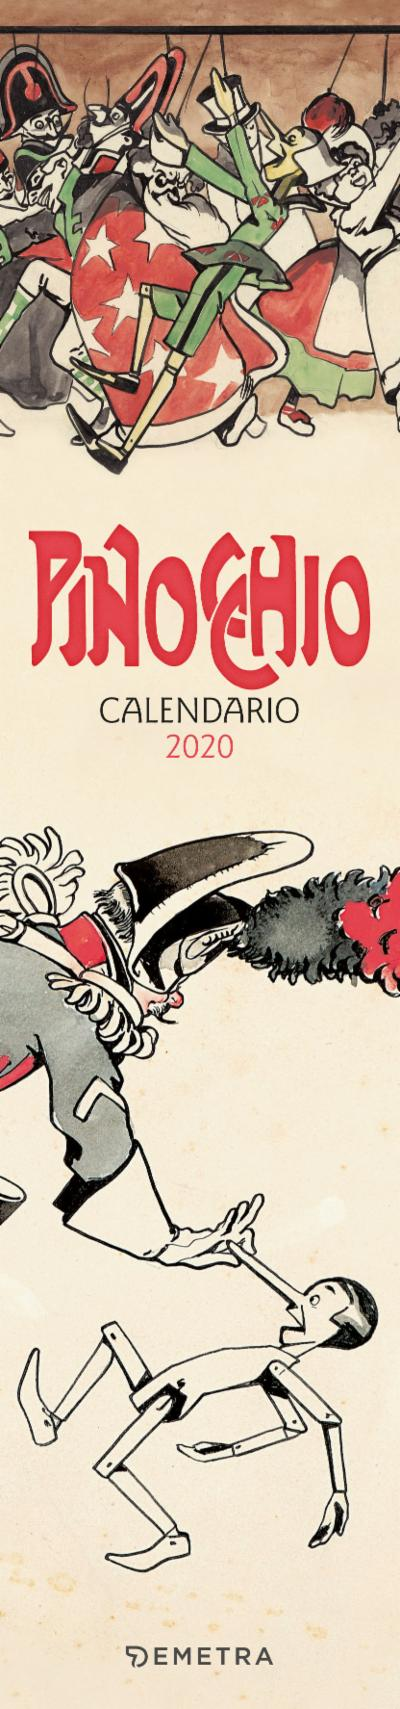 Calendario Pinocchio 2020